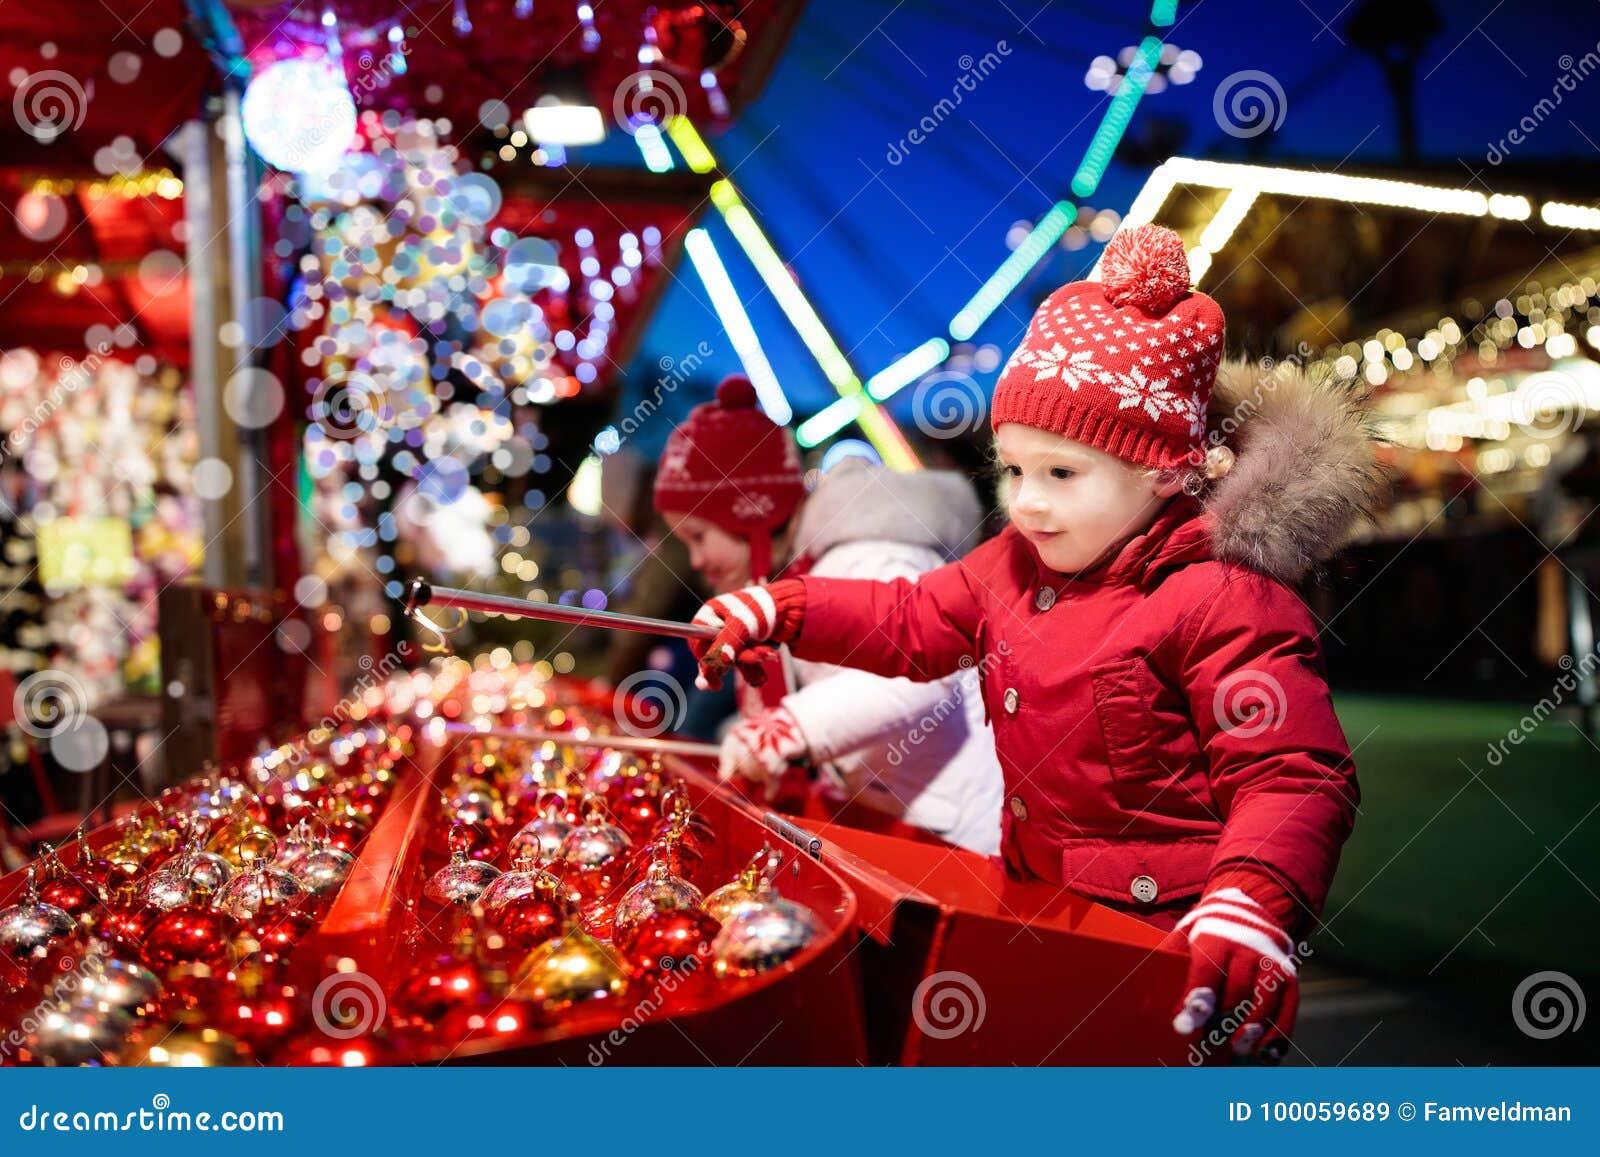 Kids At Christmas Fair. Children Shopping Xmas Gifts. Stock Image ...